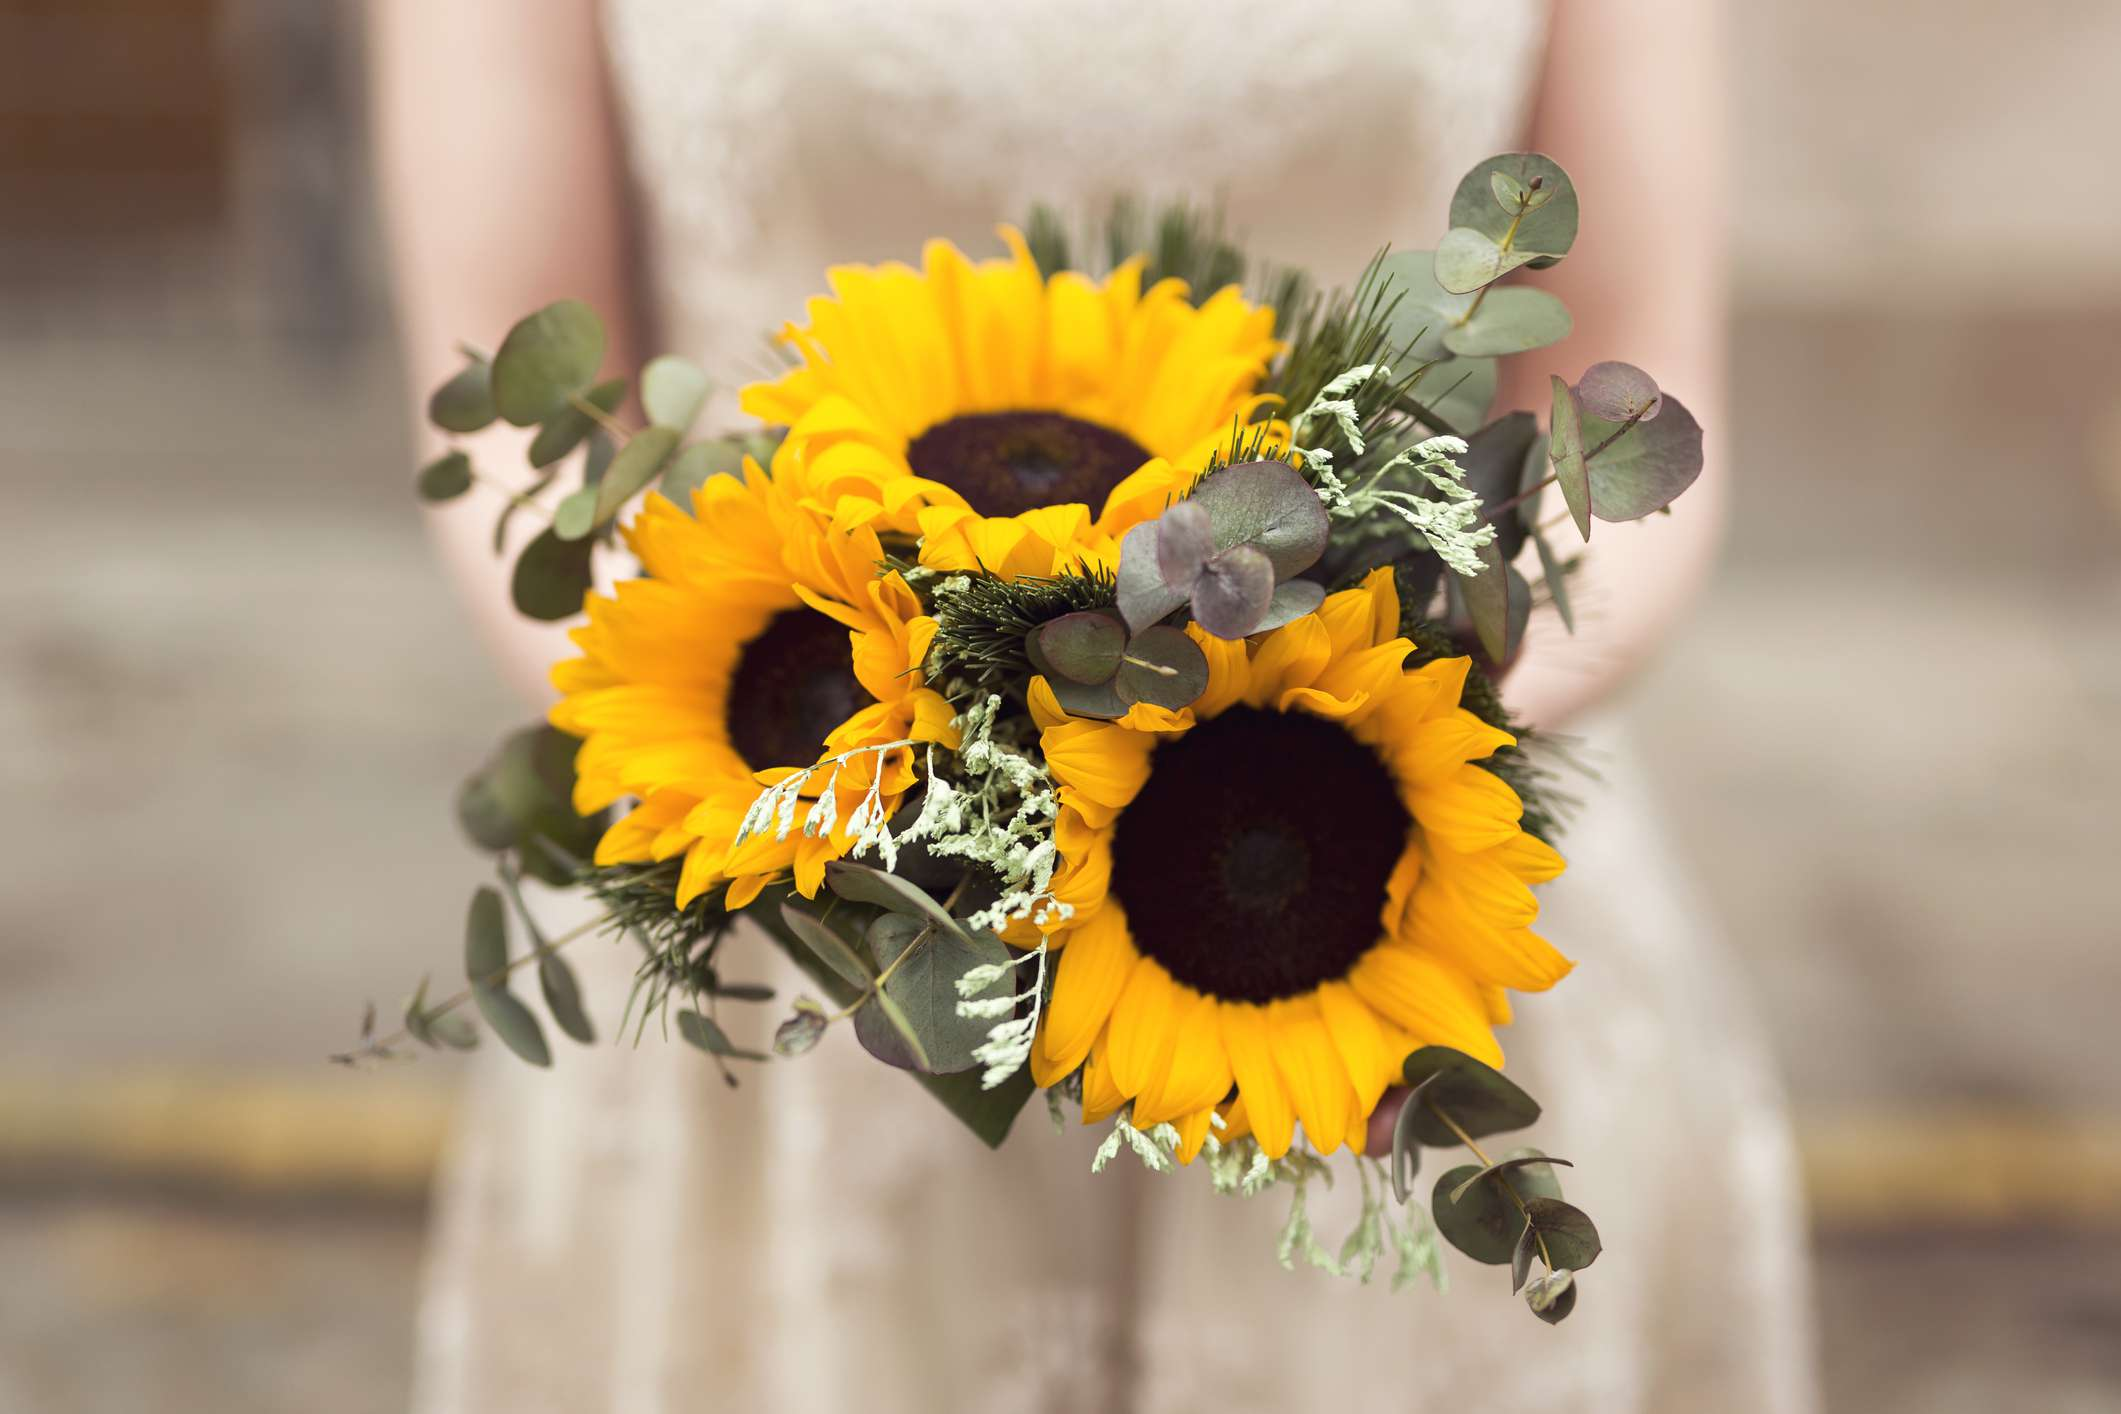 Close up of a bride holding a sunflower wedding